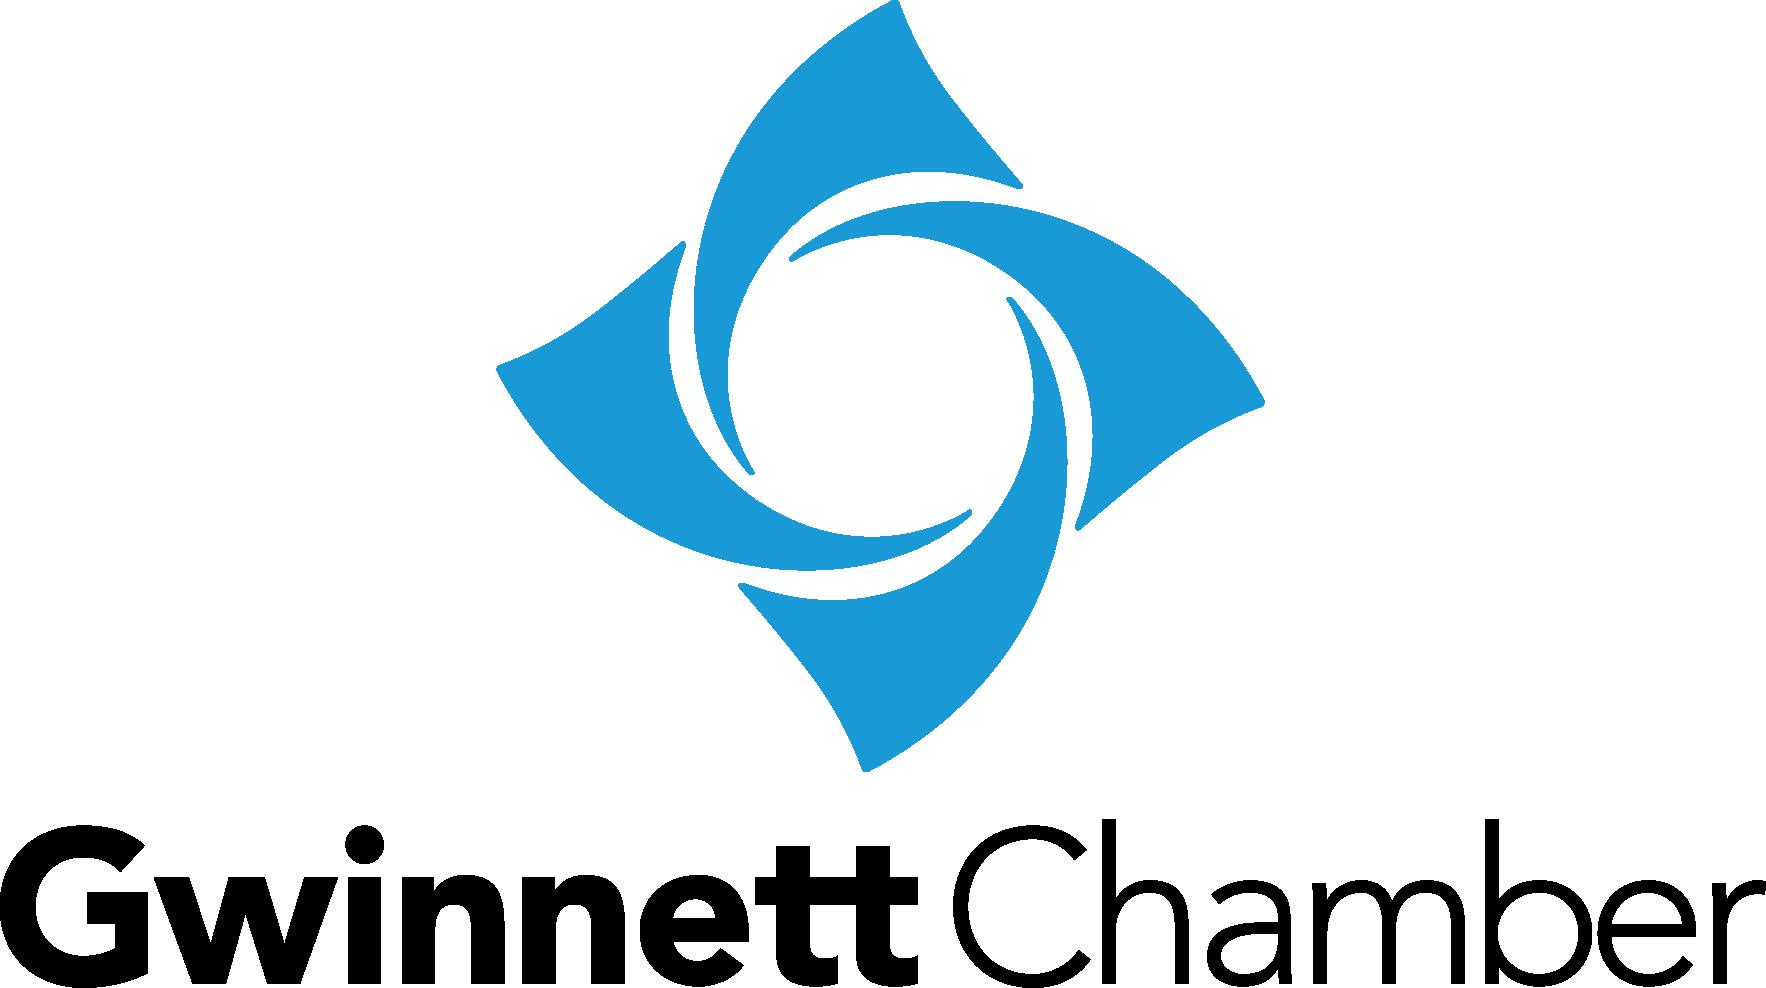 Partnership Gwinnett